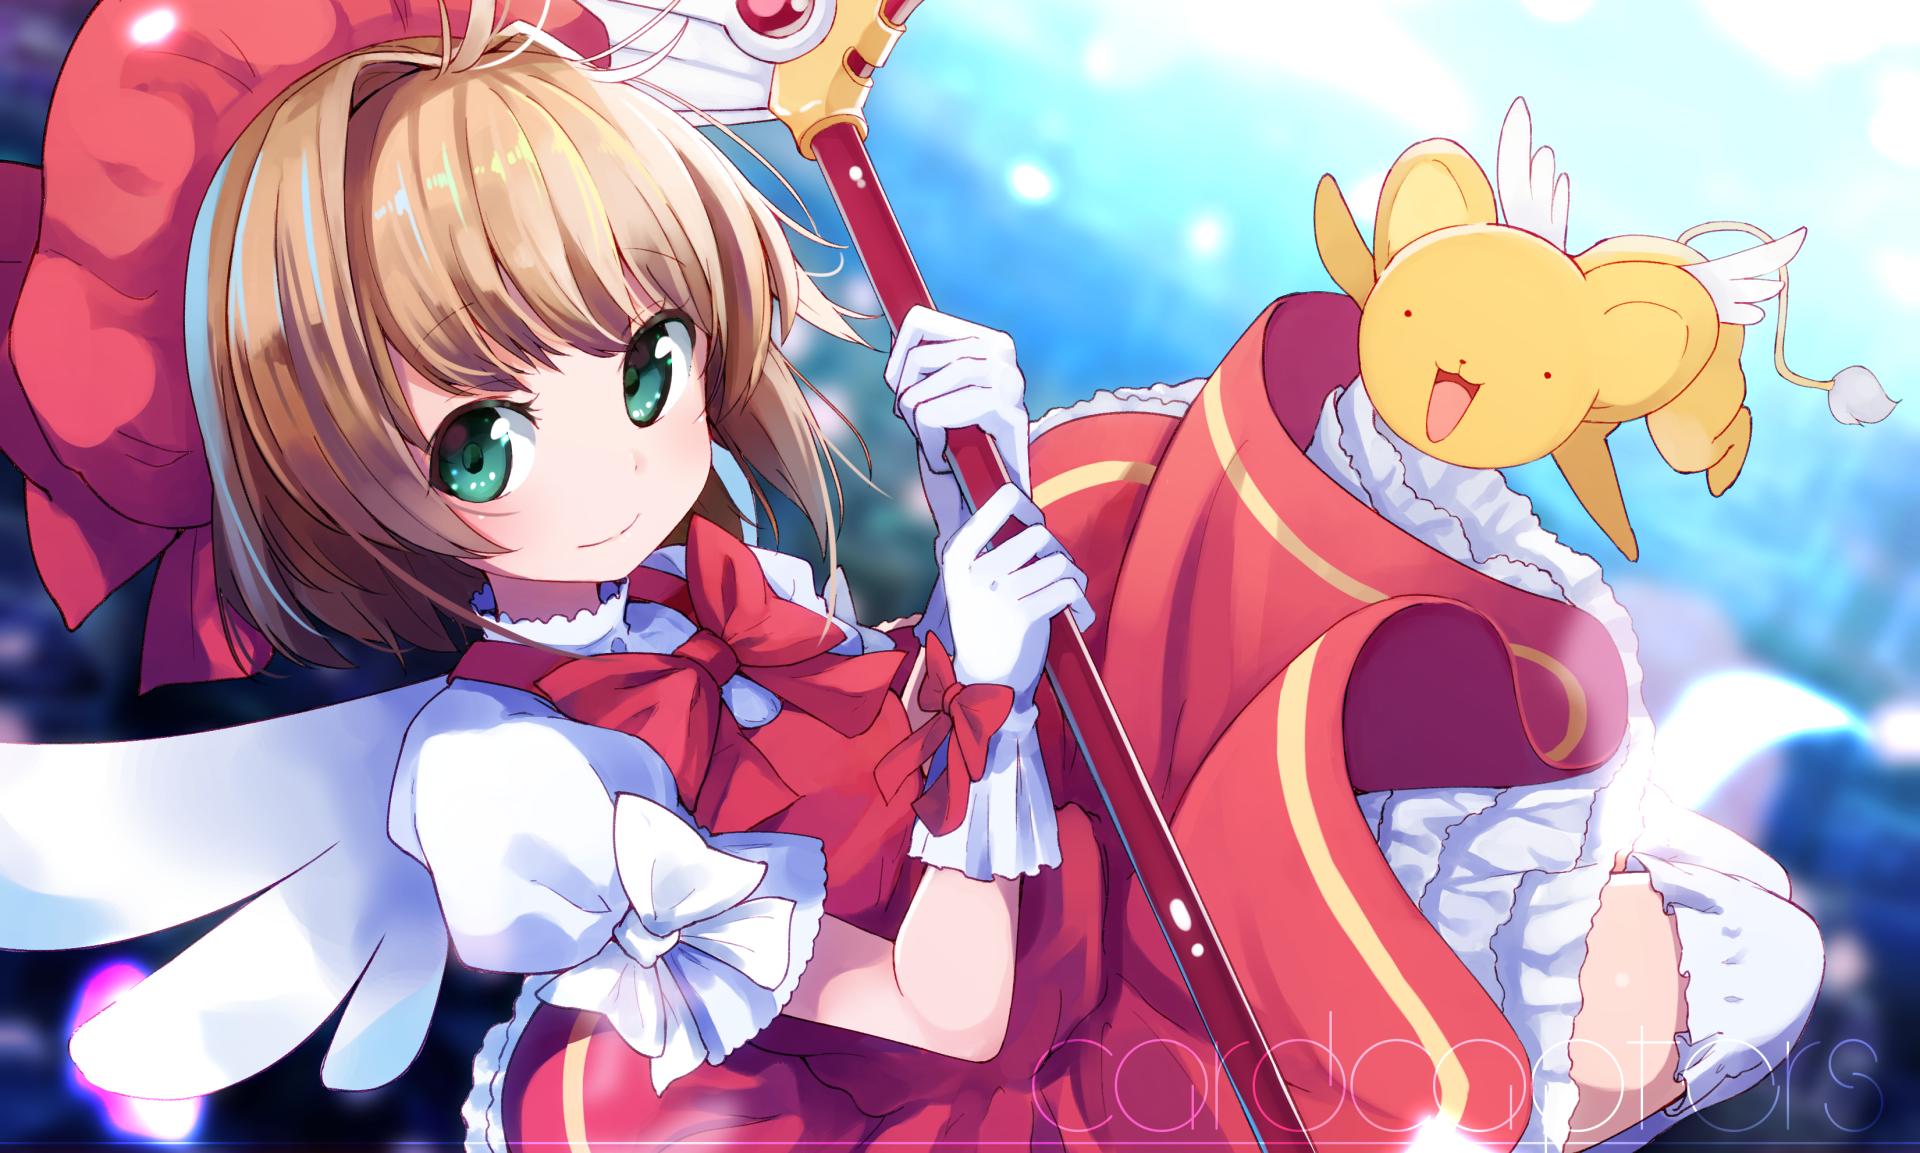 动漫 - 魔卡少女樱  Sakura Kinomoto Keroberos (Card Captor Sakura) 壁纸